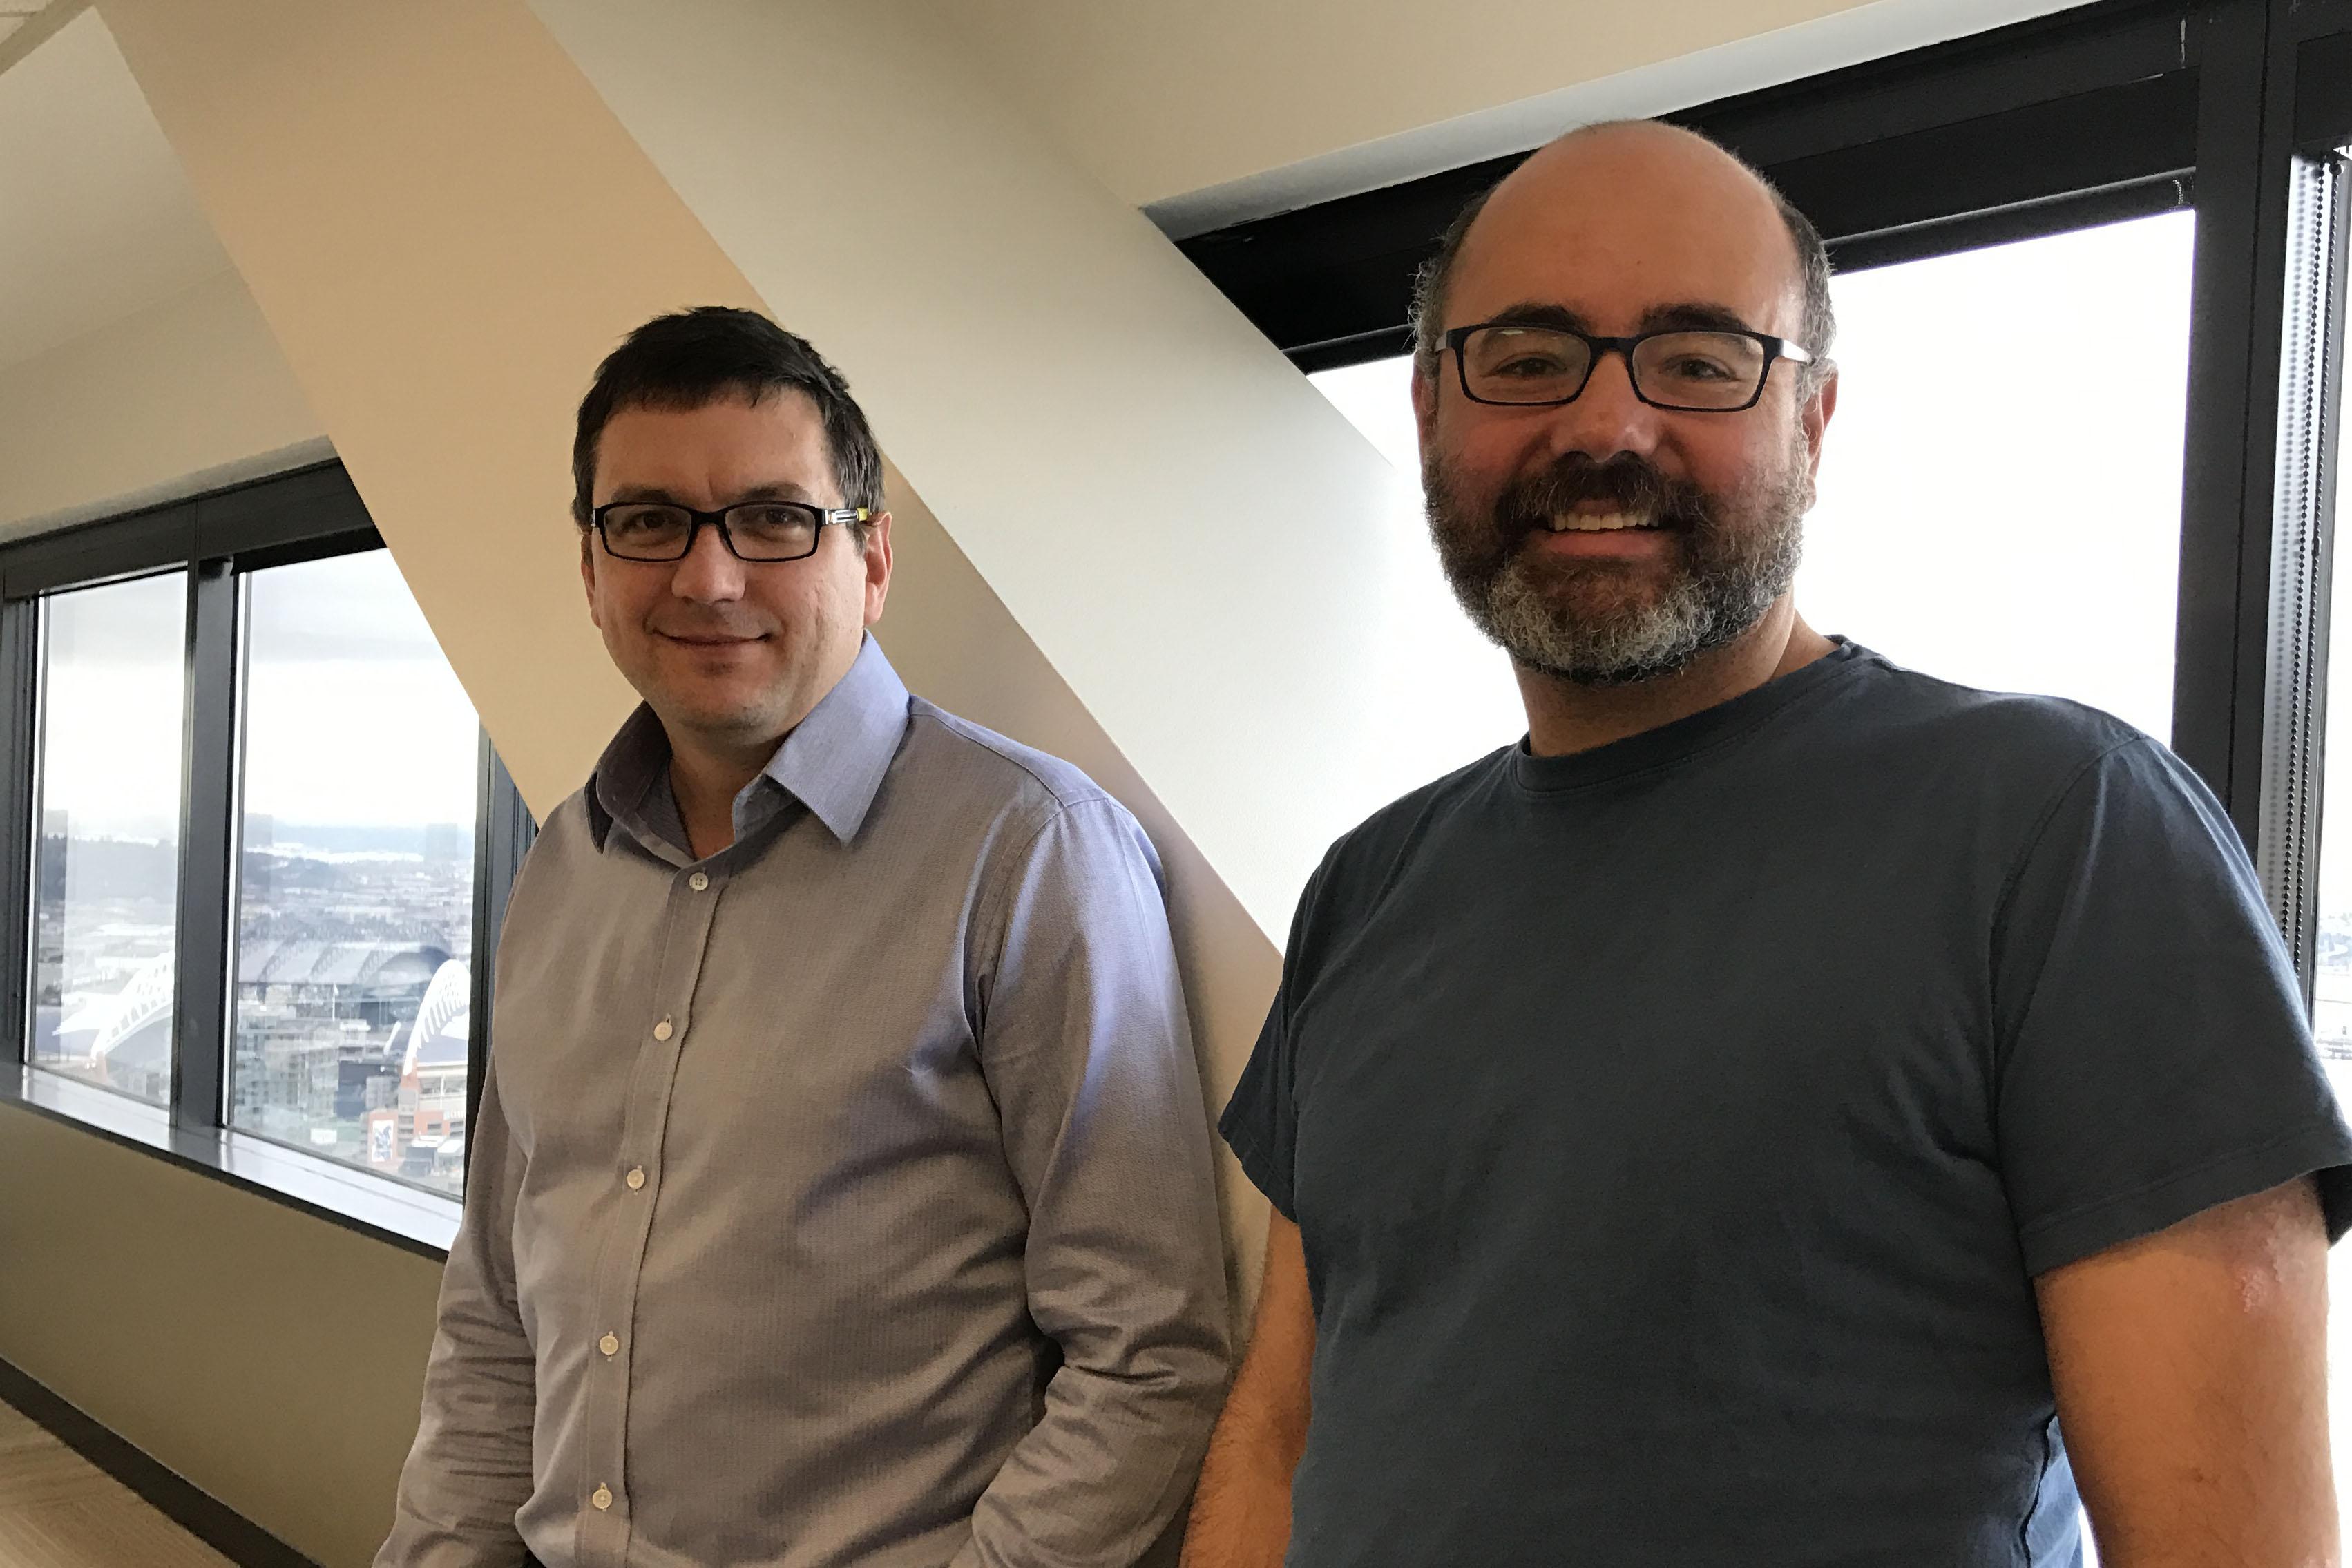 Craig McLuckie and Joe Beda, co-founders of Heptio.